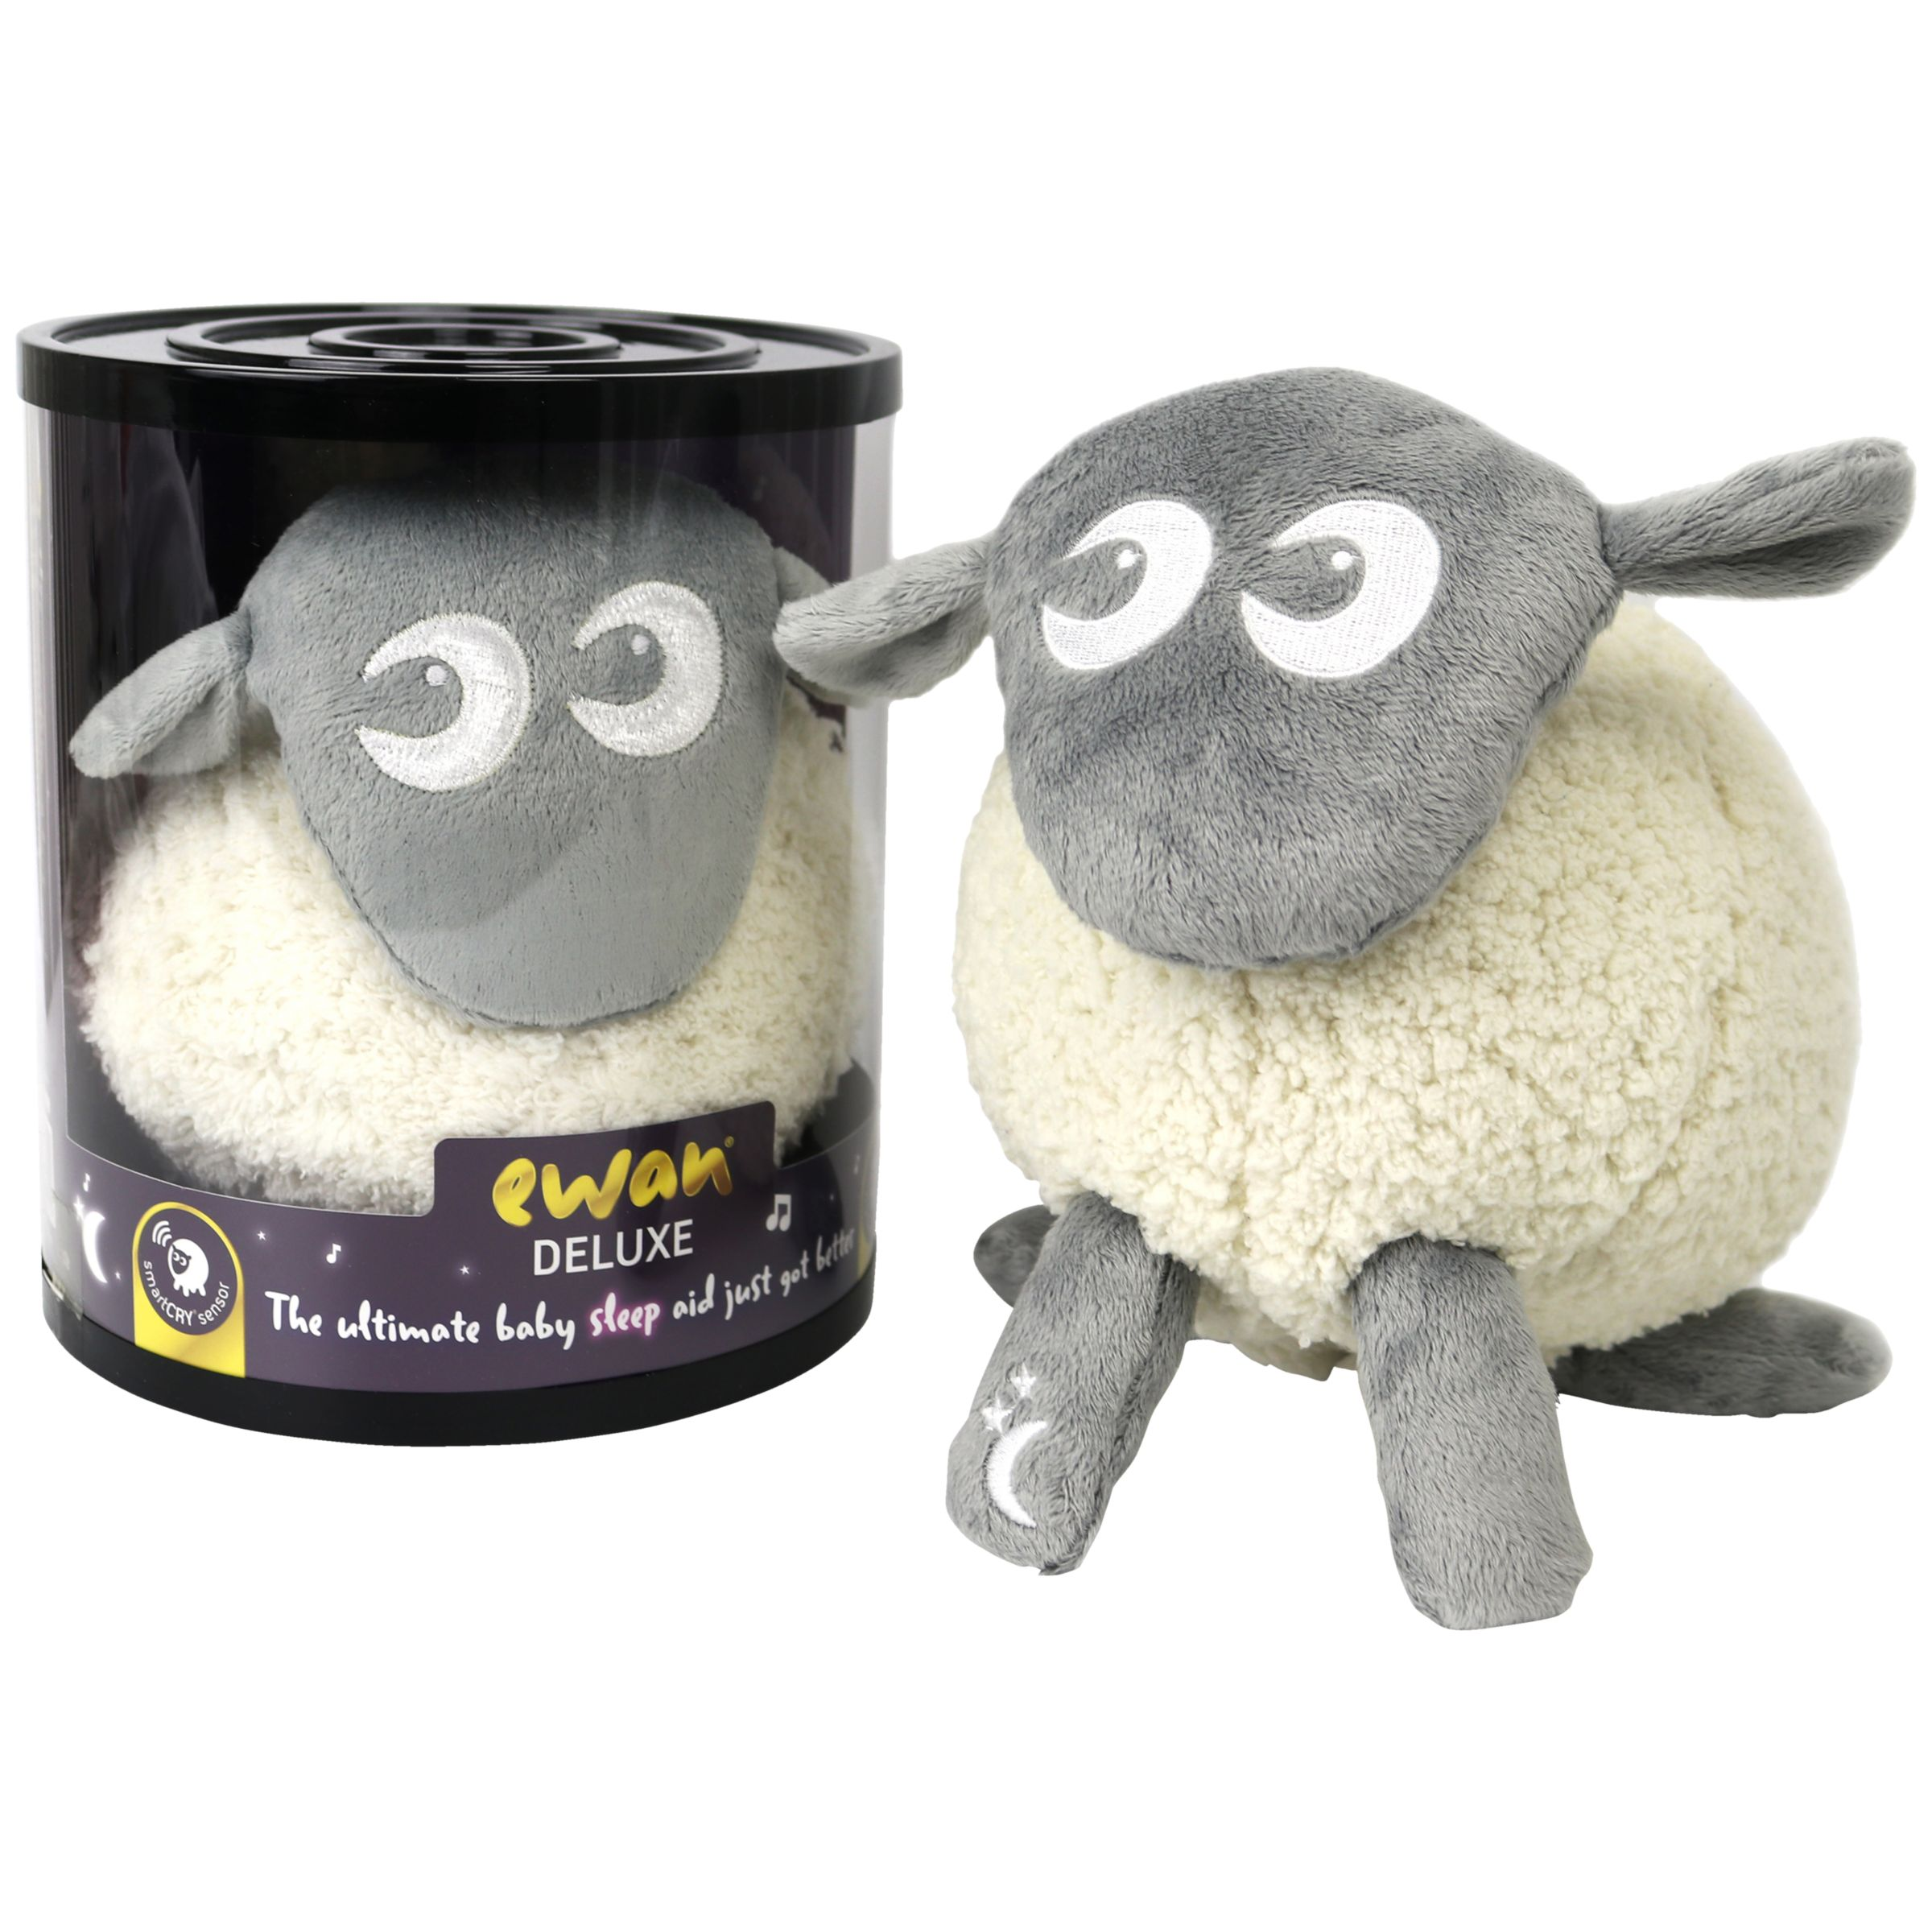 Ewan The Dream Sheep Ewan The Dream Sheep Deluxe